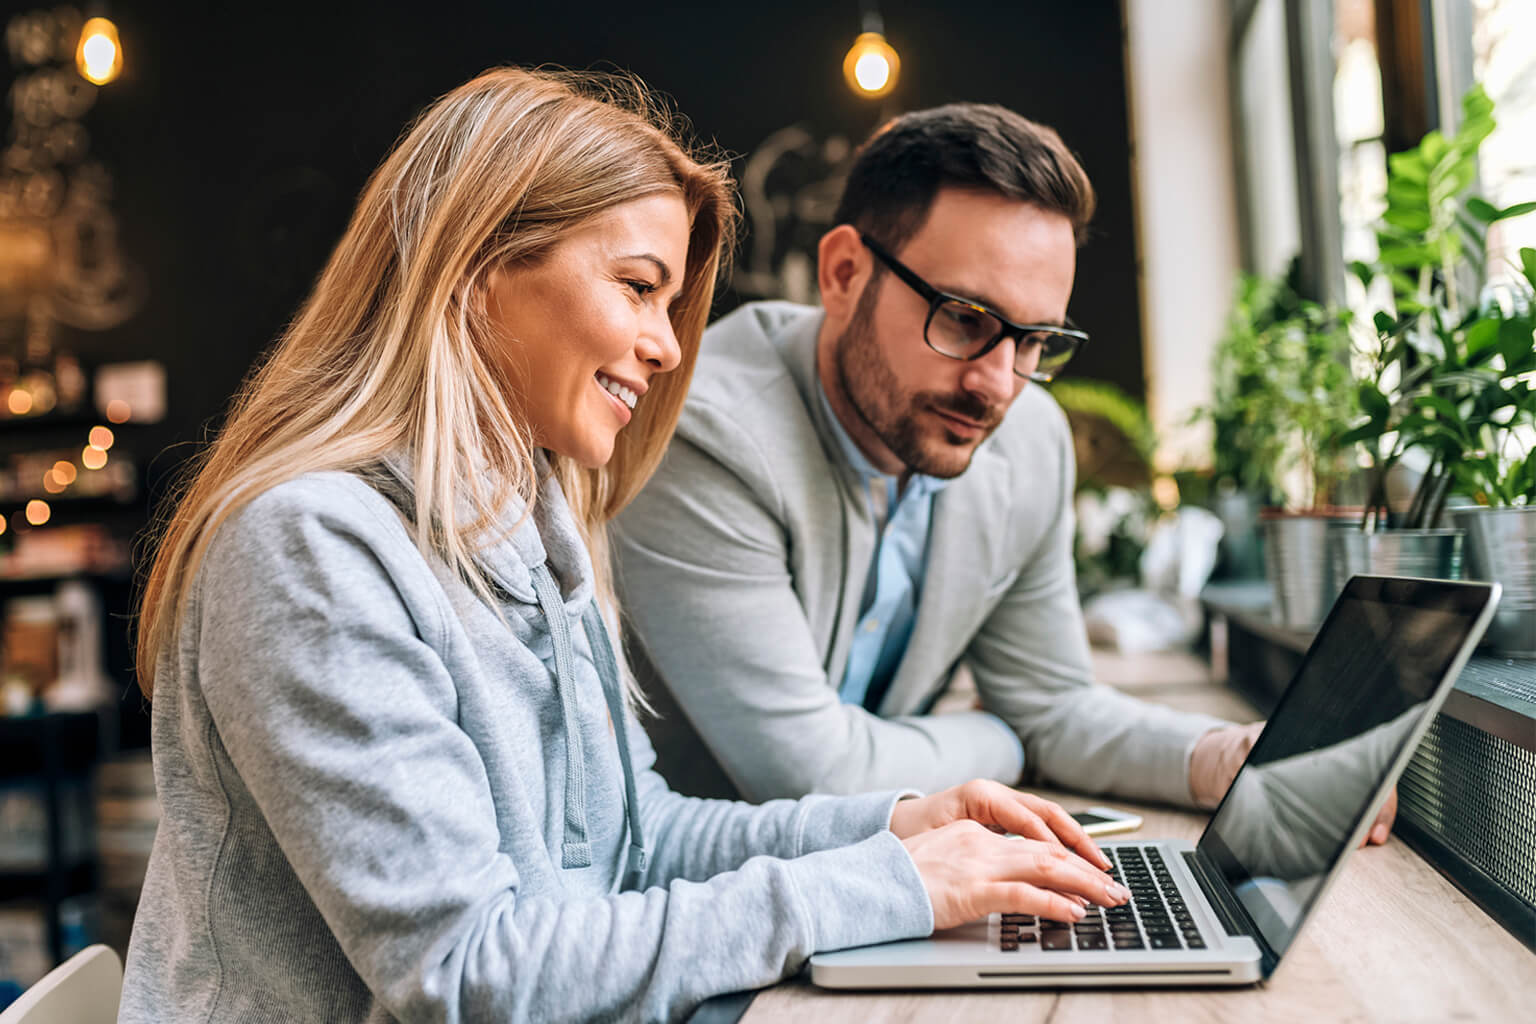 Keys to Project Management Success